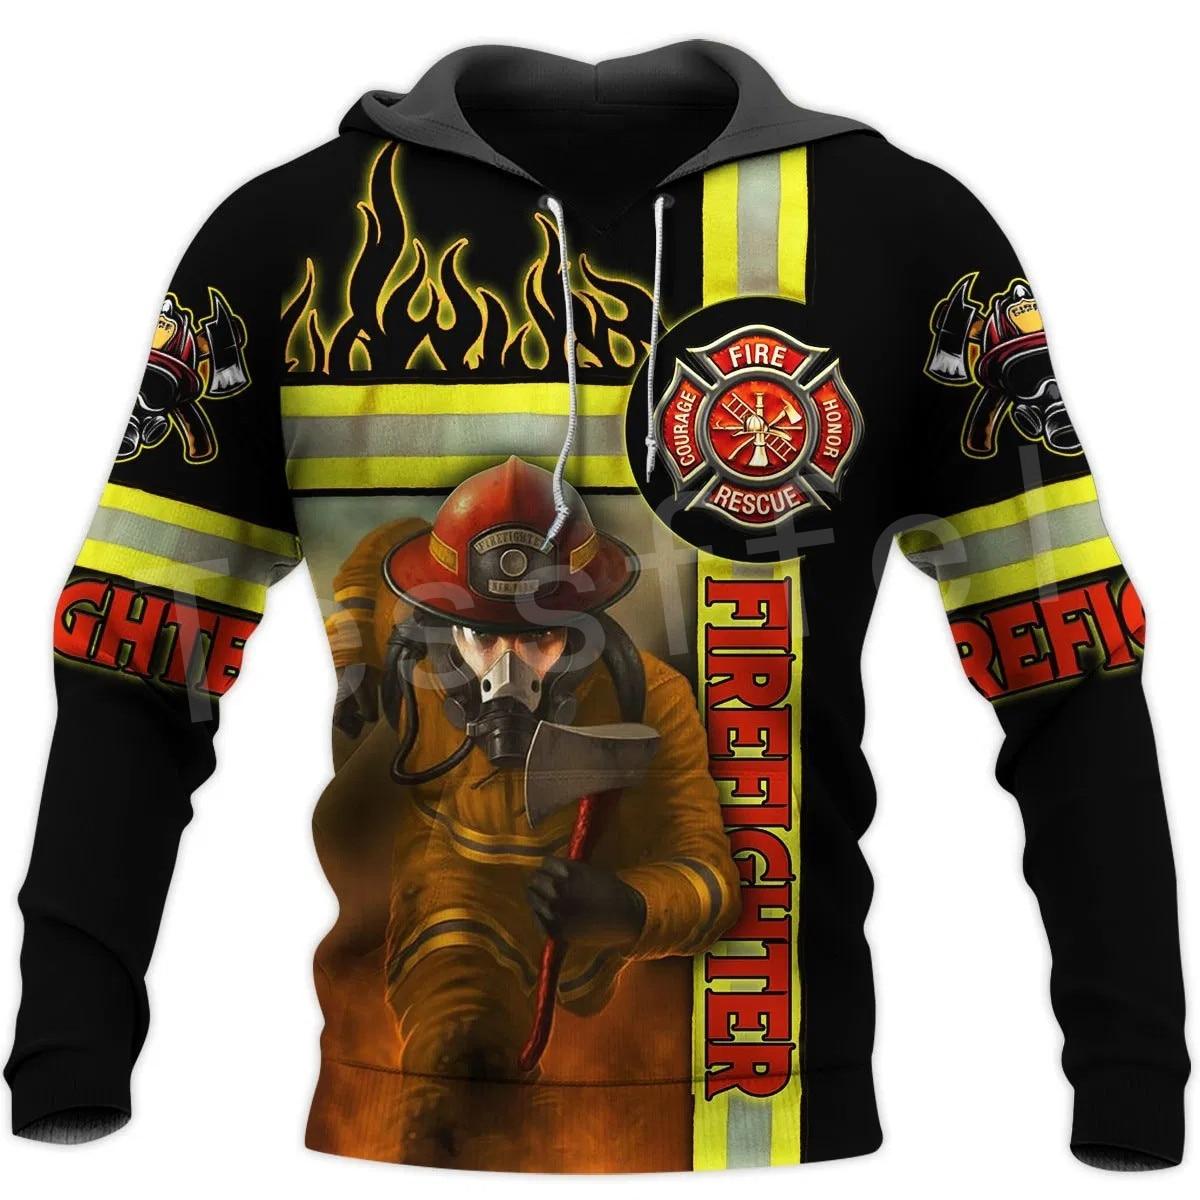 Tessffel Firefighters Suit Firemen Hero Harajuku Pullover NewFashion Funny Unisex 3DPrint Zipper/Hoodies/Sweatshirts/Jacket A-19